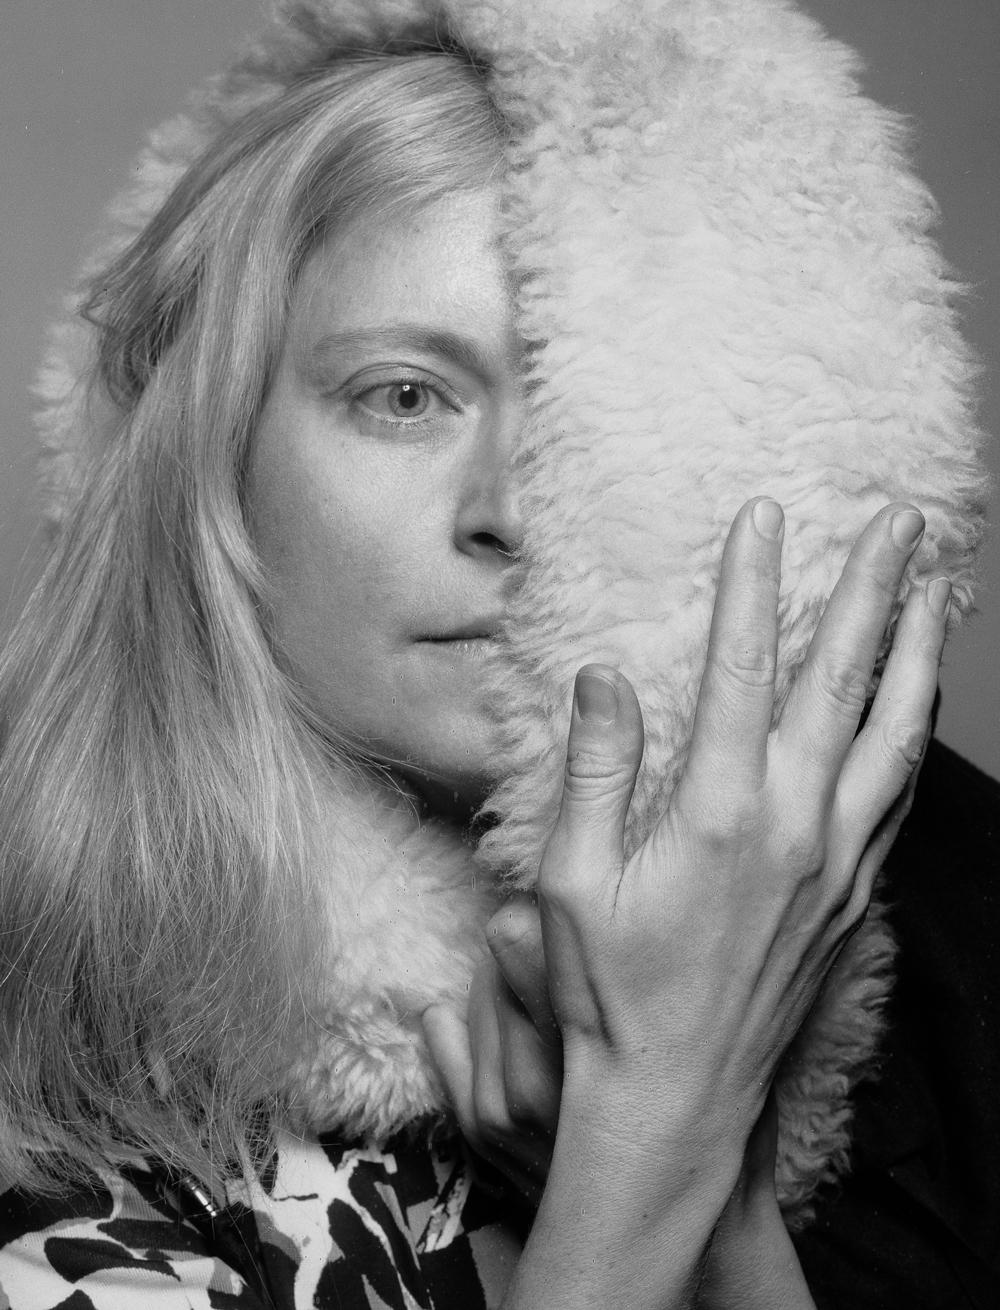 irene caesar - self portrait with a fur collar fragment